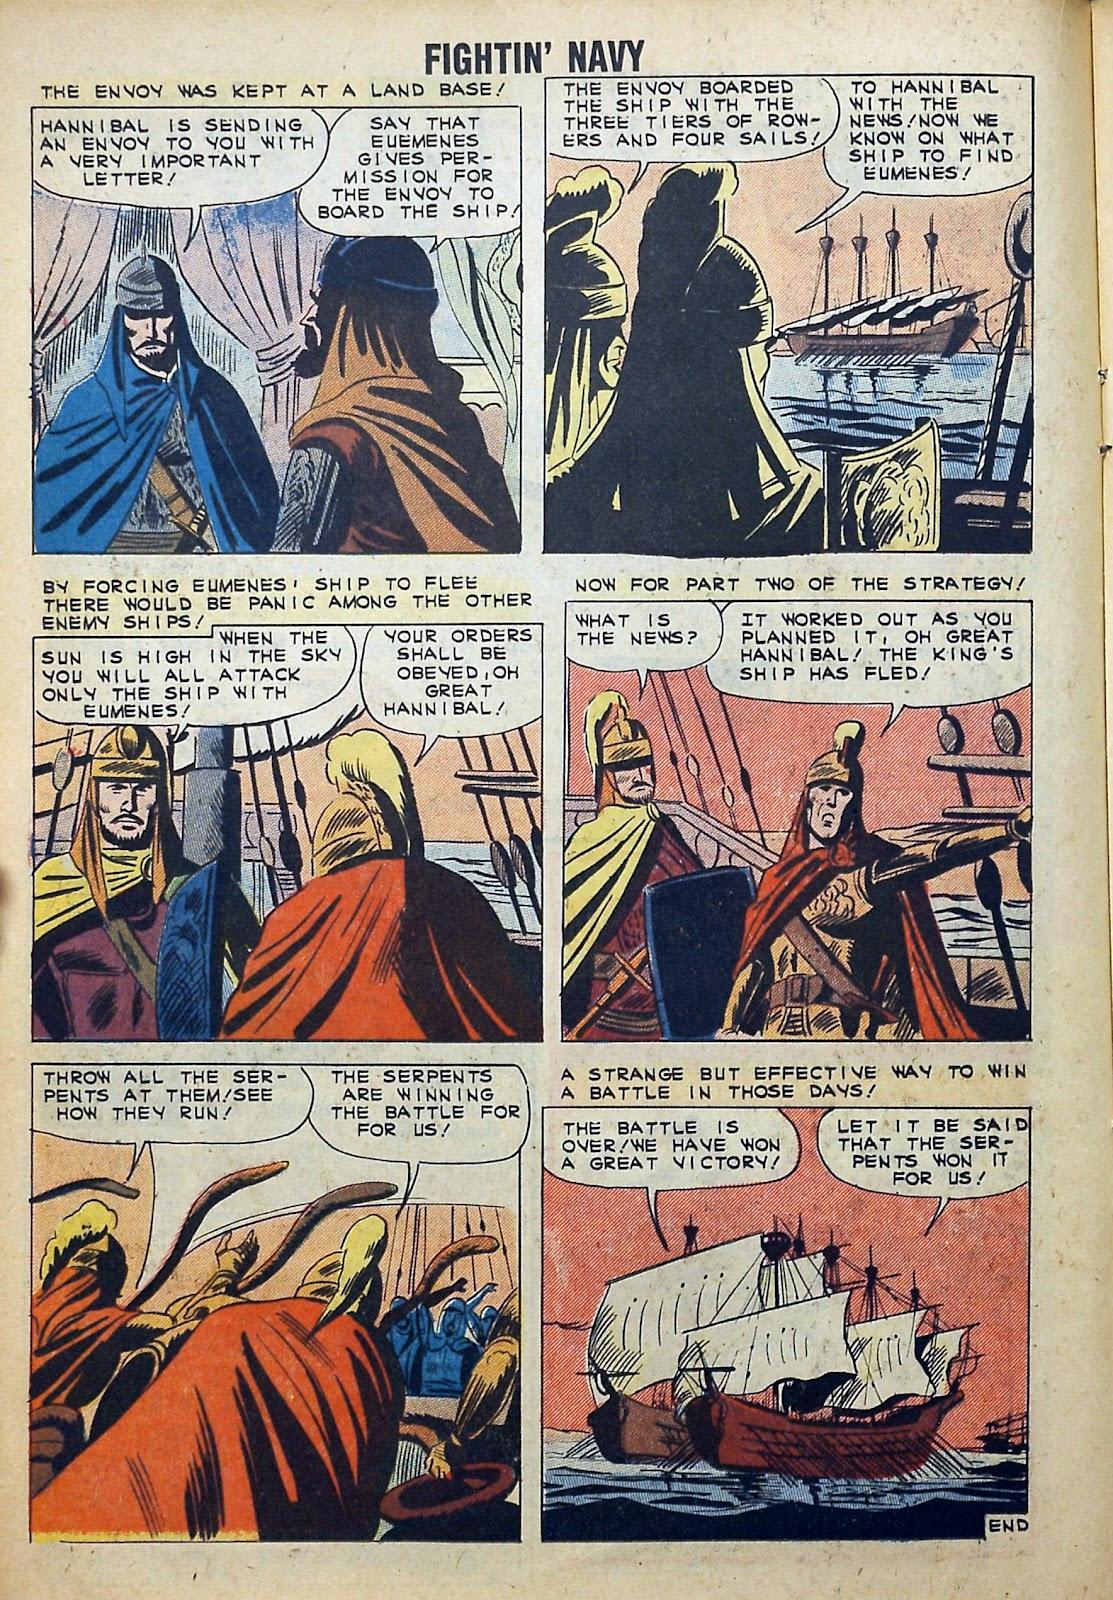 Read online Fightin' Navy comic -  Issue #99 - 16